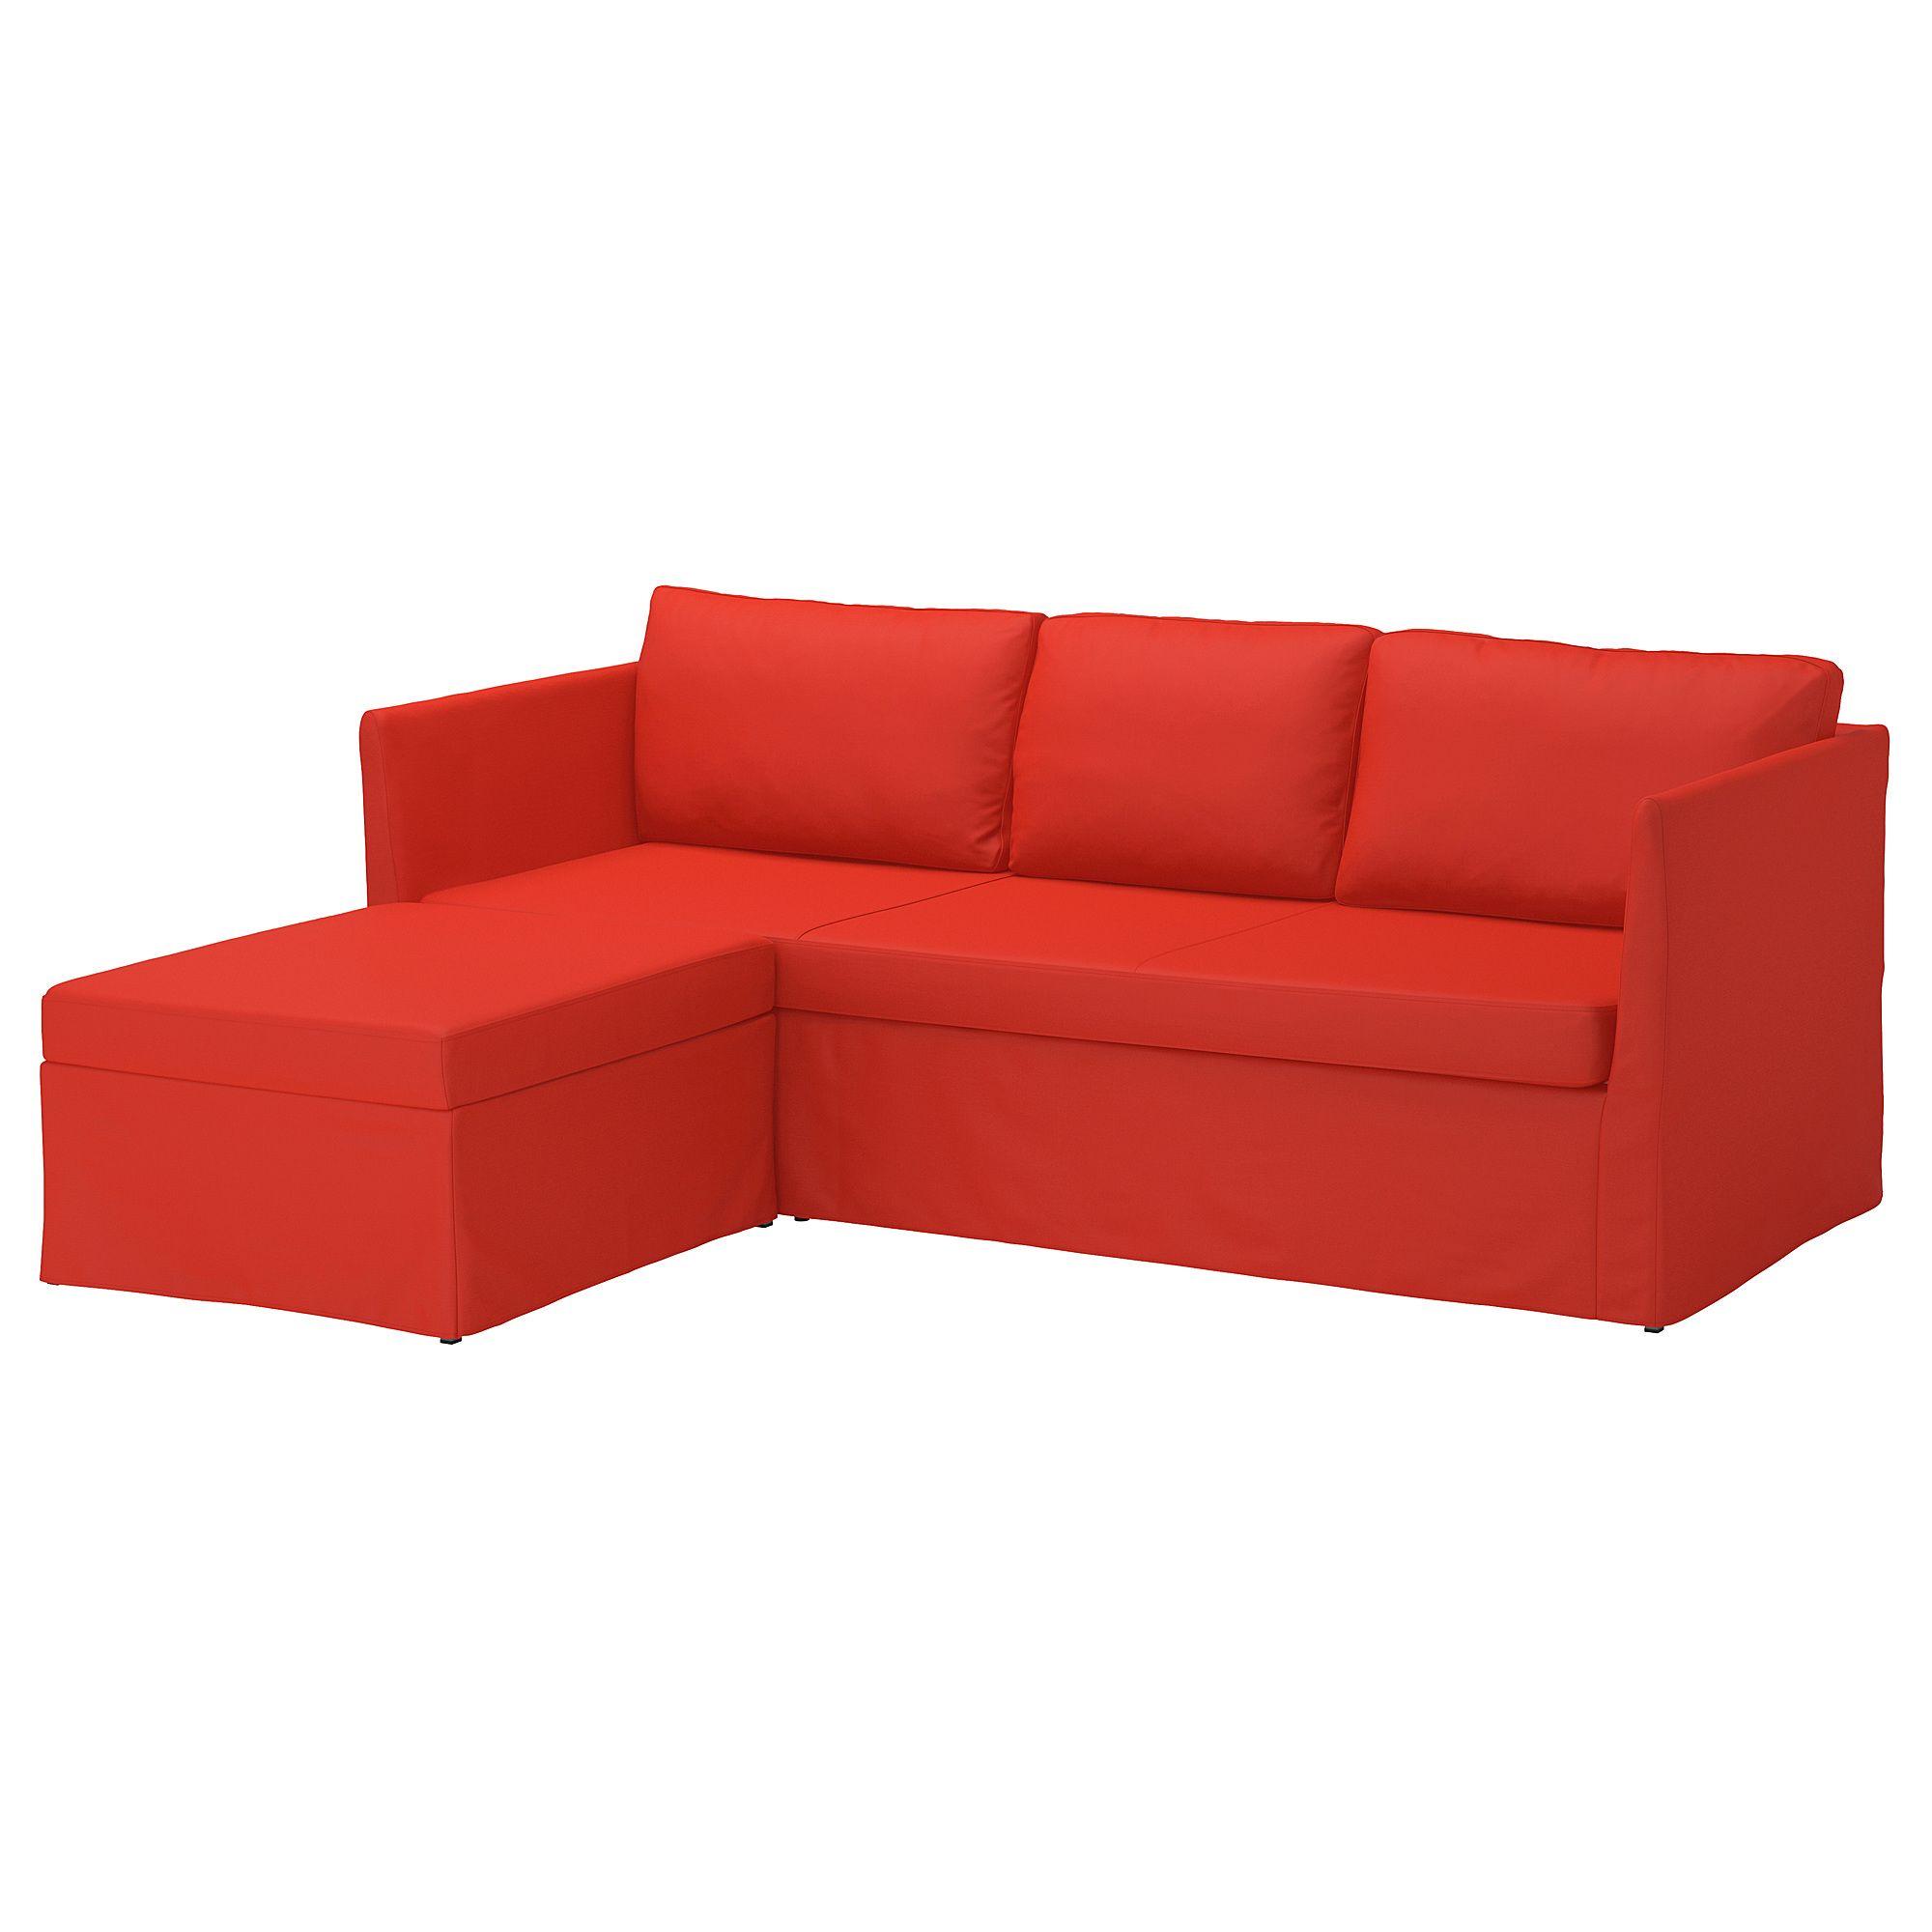 ikea br thult cover for 3 seat corner sectional vissle red orange rh pinterest com